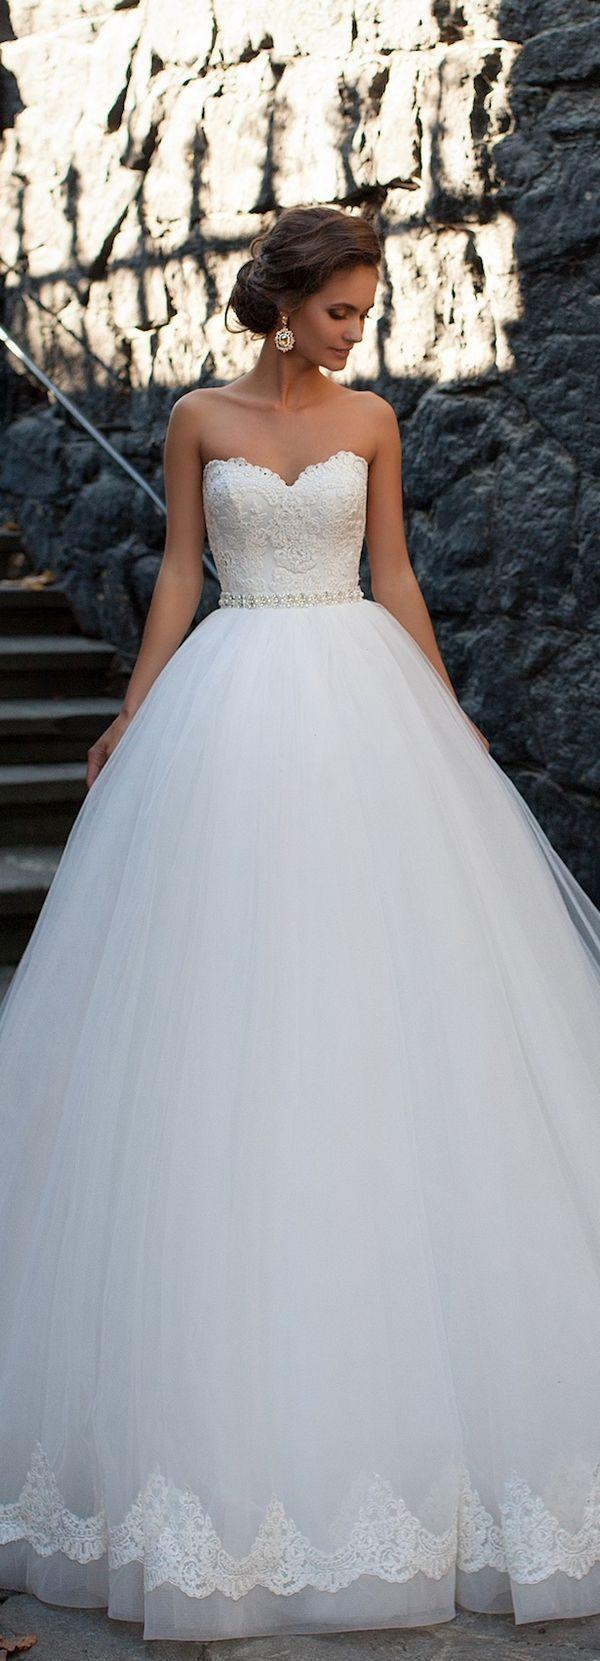 Ideas for Wedding Dresses - Informal Wedding Dresses for Older ...